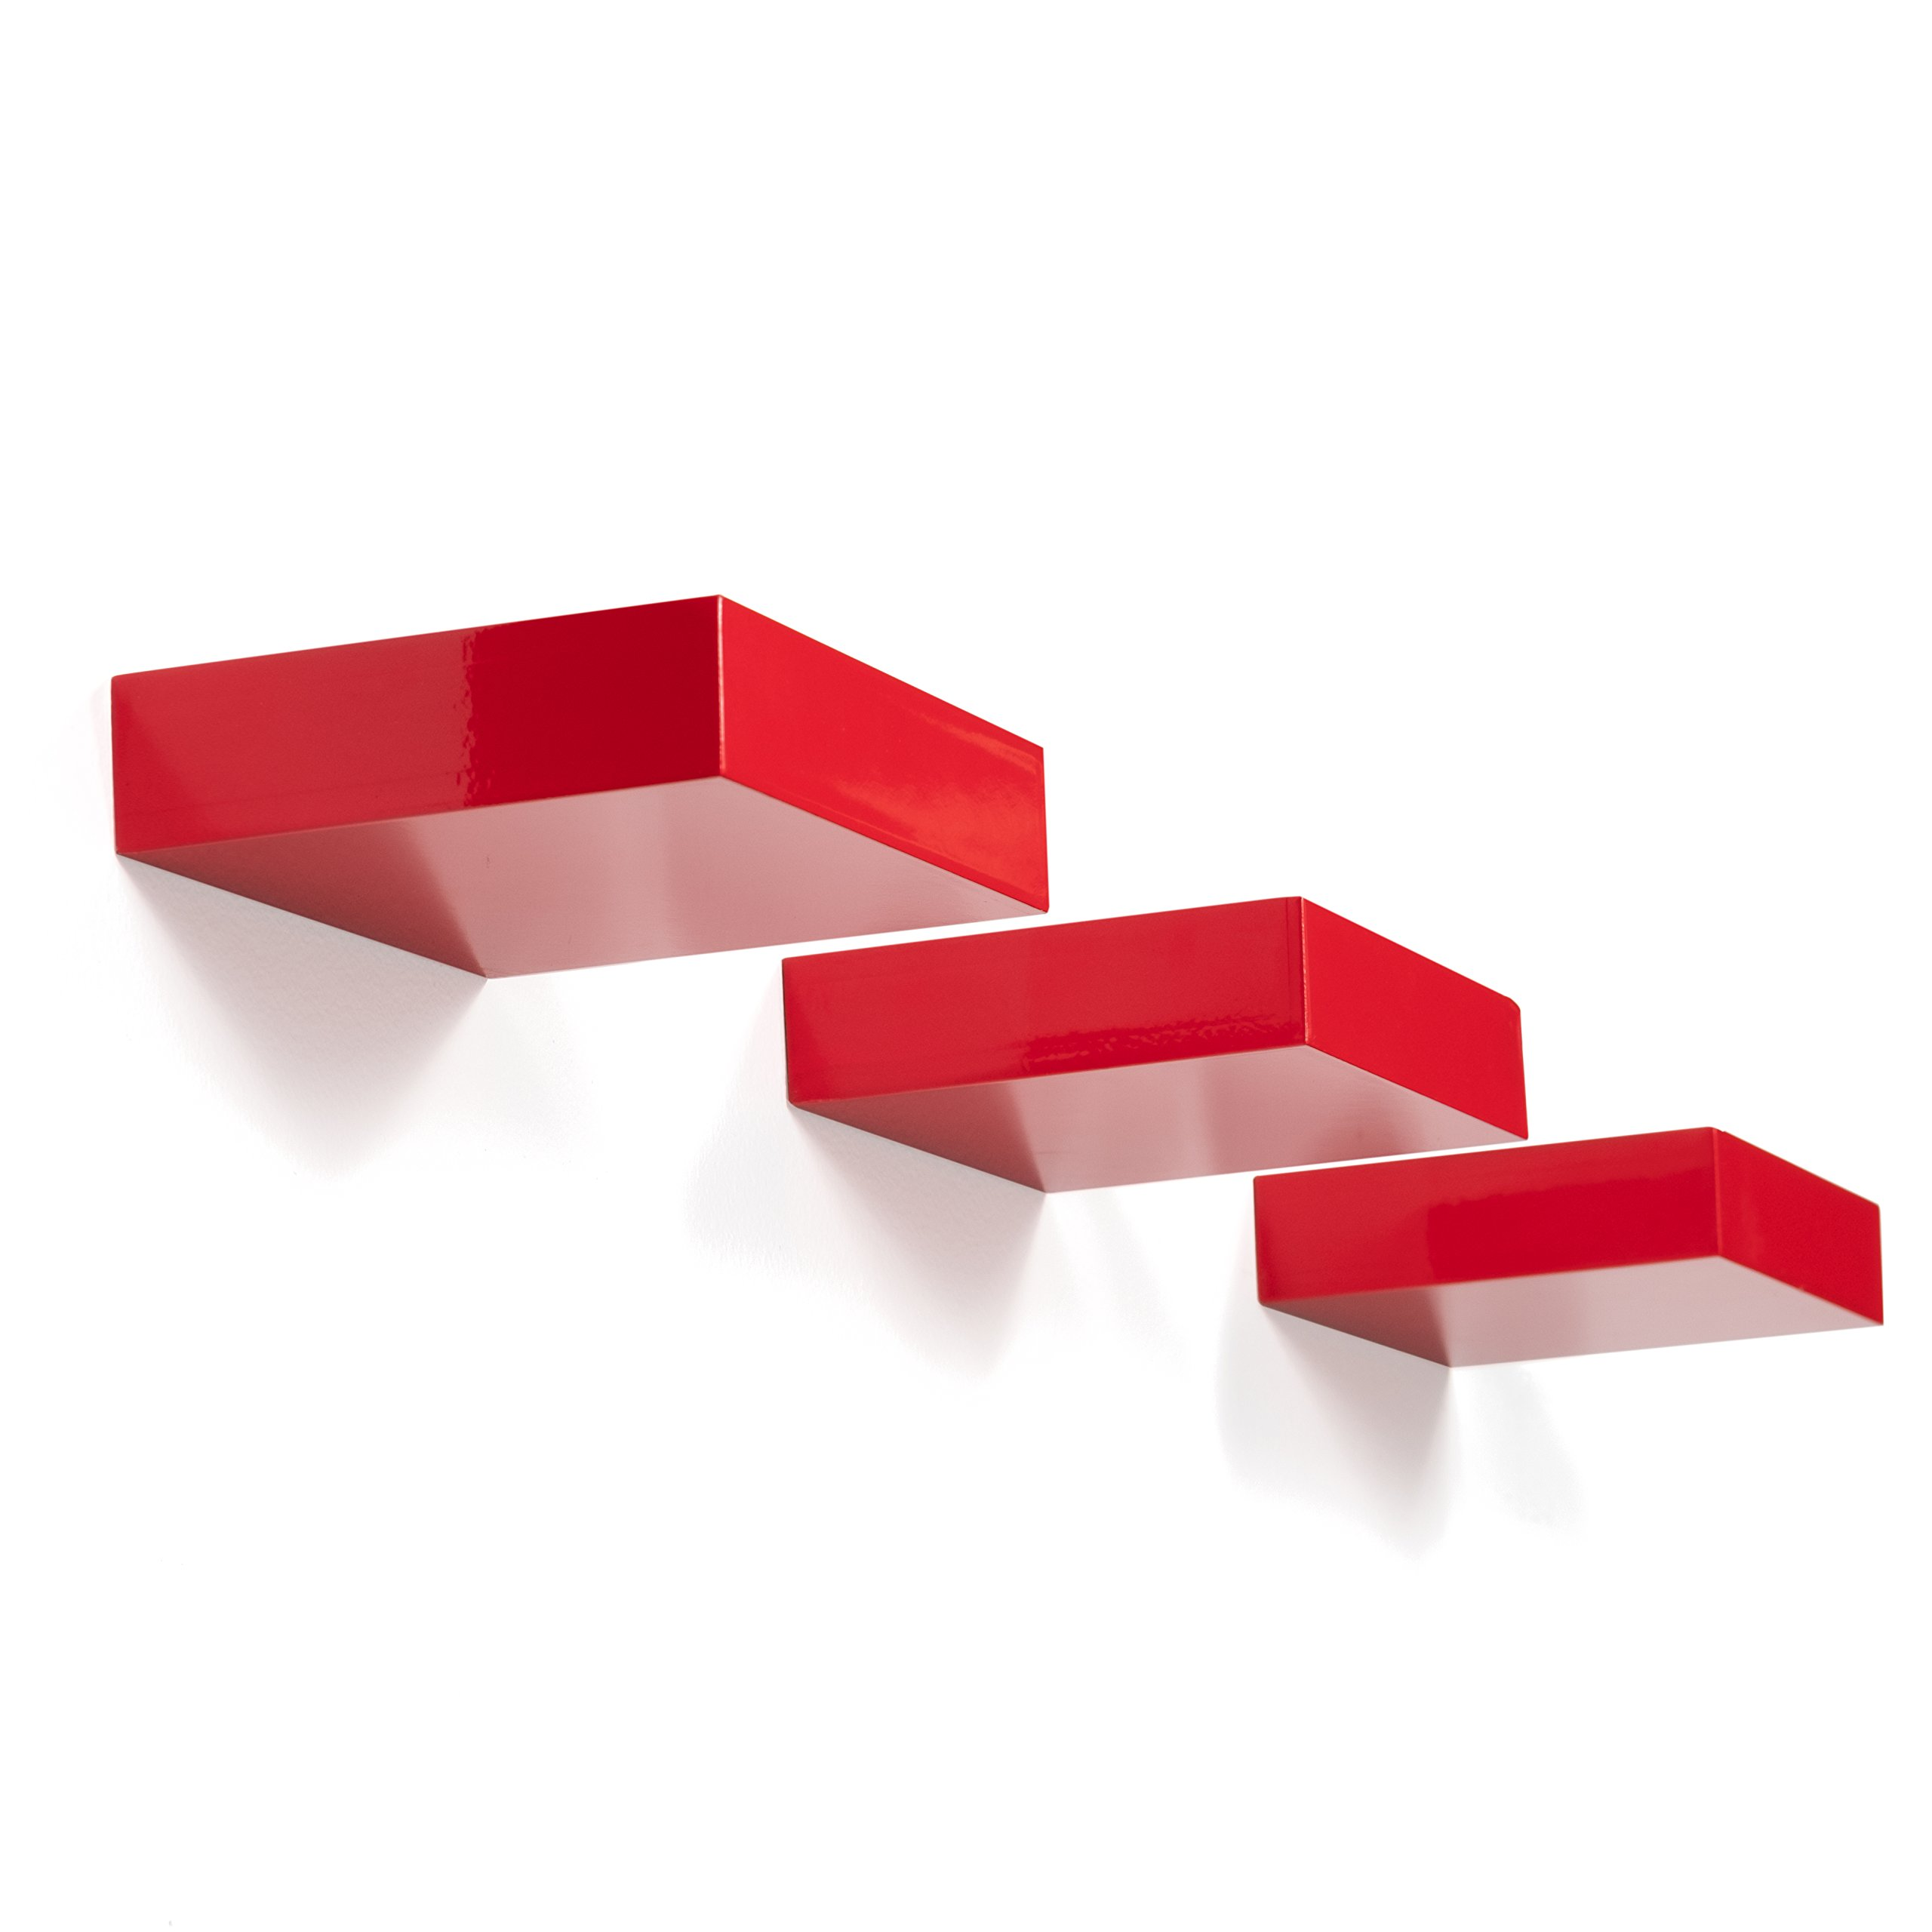 Brightmaison Showcase Wall Display Shelf Modern Glossy Each Floating Ledge Shelf(Red)